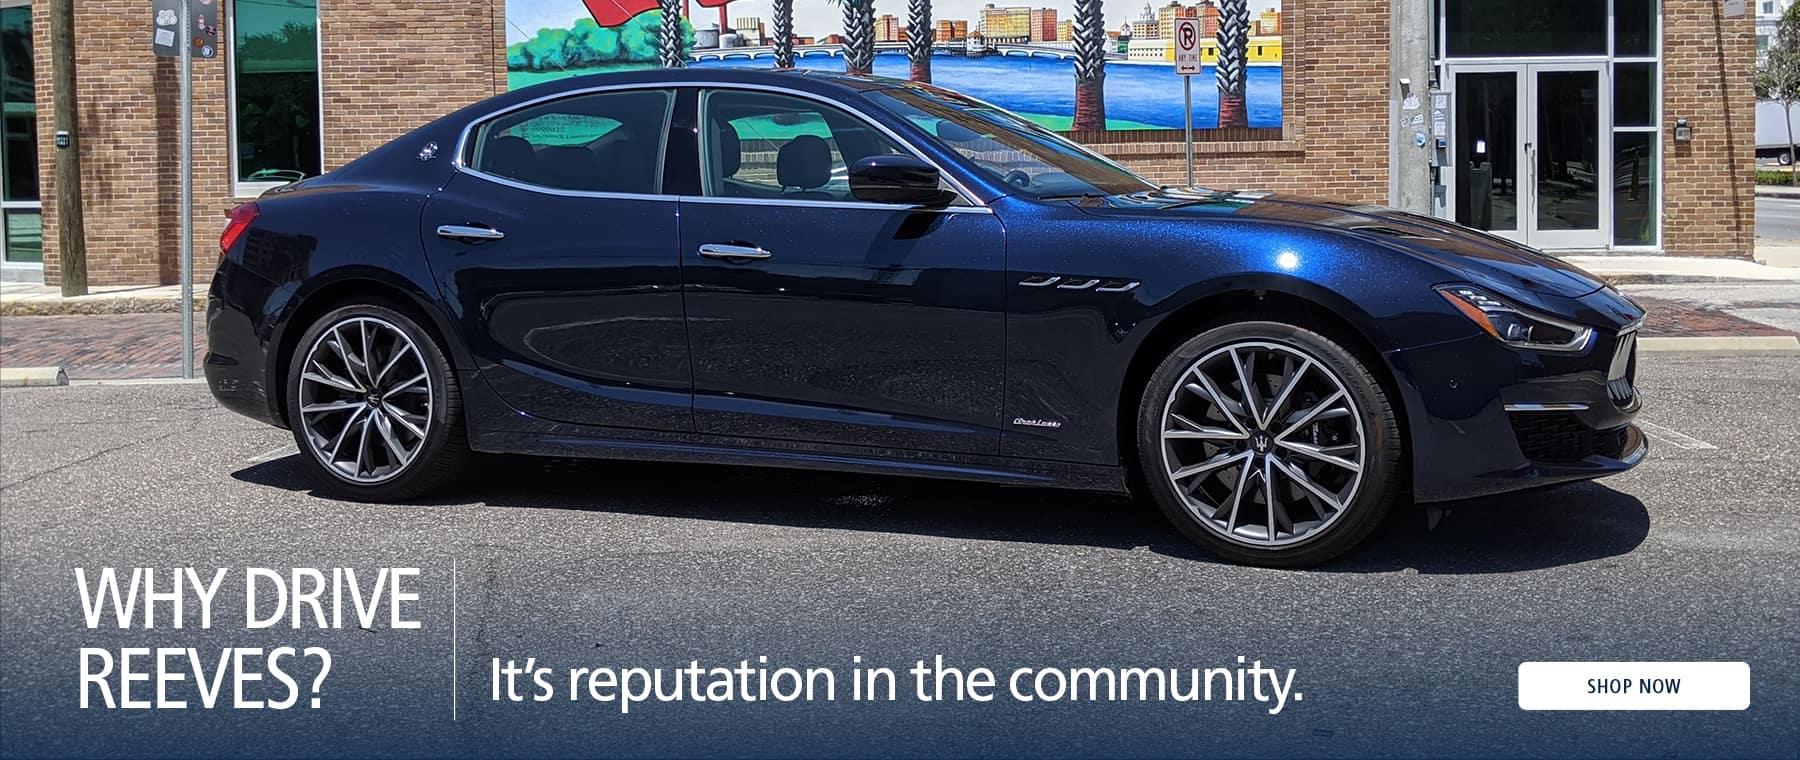 Jan-Maserati-WhyDriveReeves_V2_1800x760